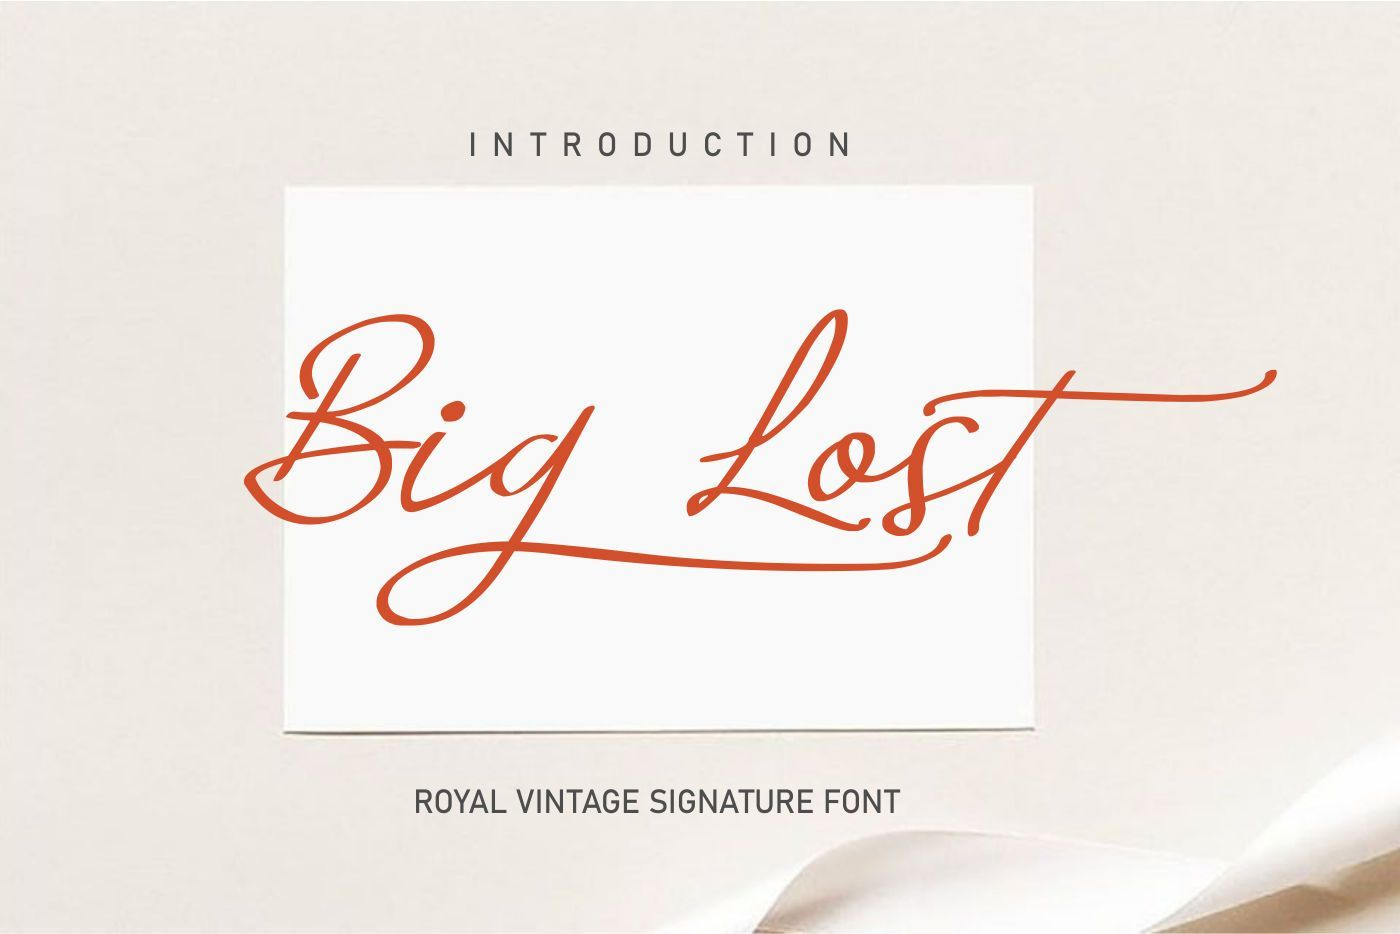 Big-Lost-Royal-Vintage-Signature-Font